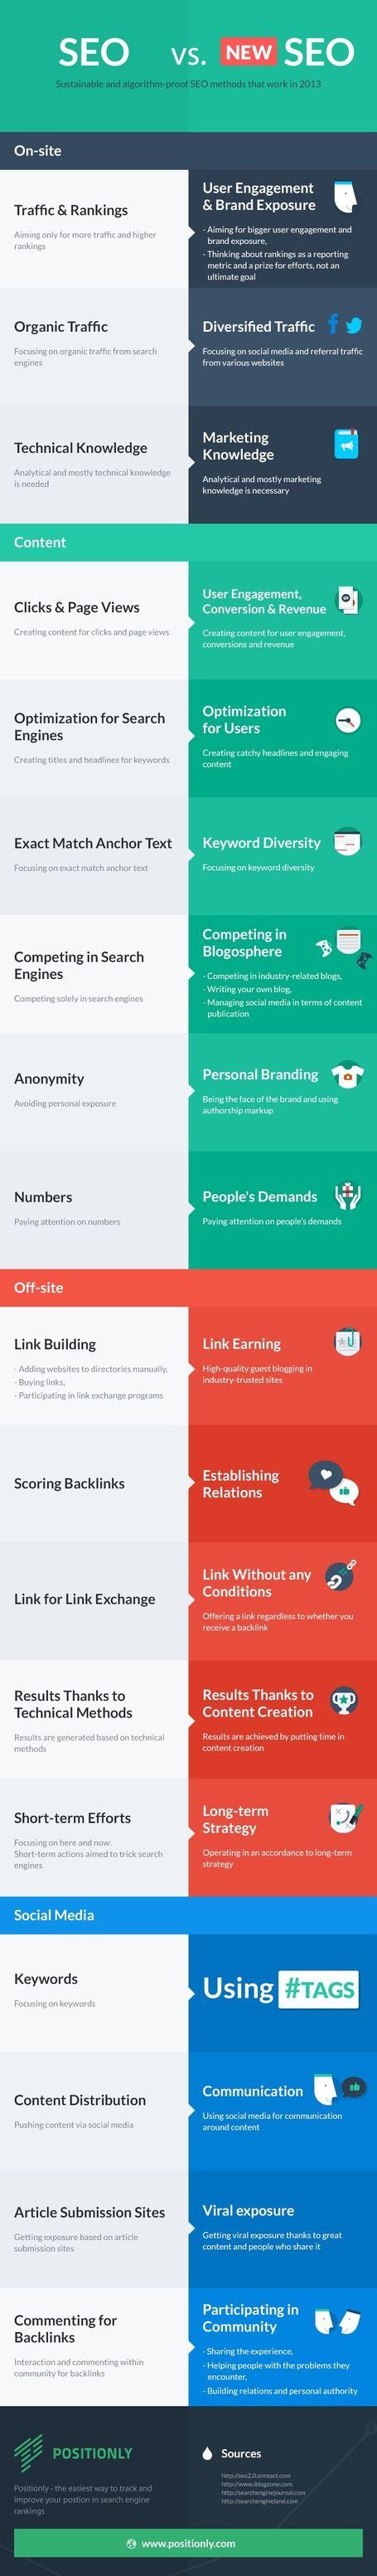 SEO New vs. Old: Social Media & Sustainable SEO: Infographic | Social Marketing Revolution | Scoop.it